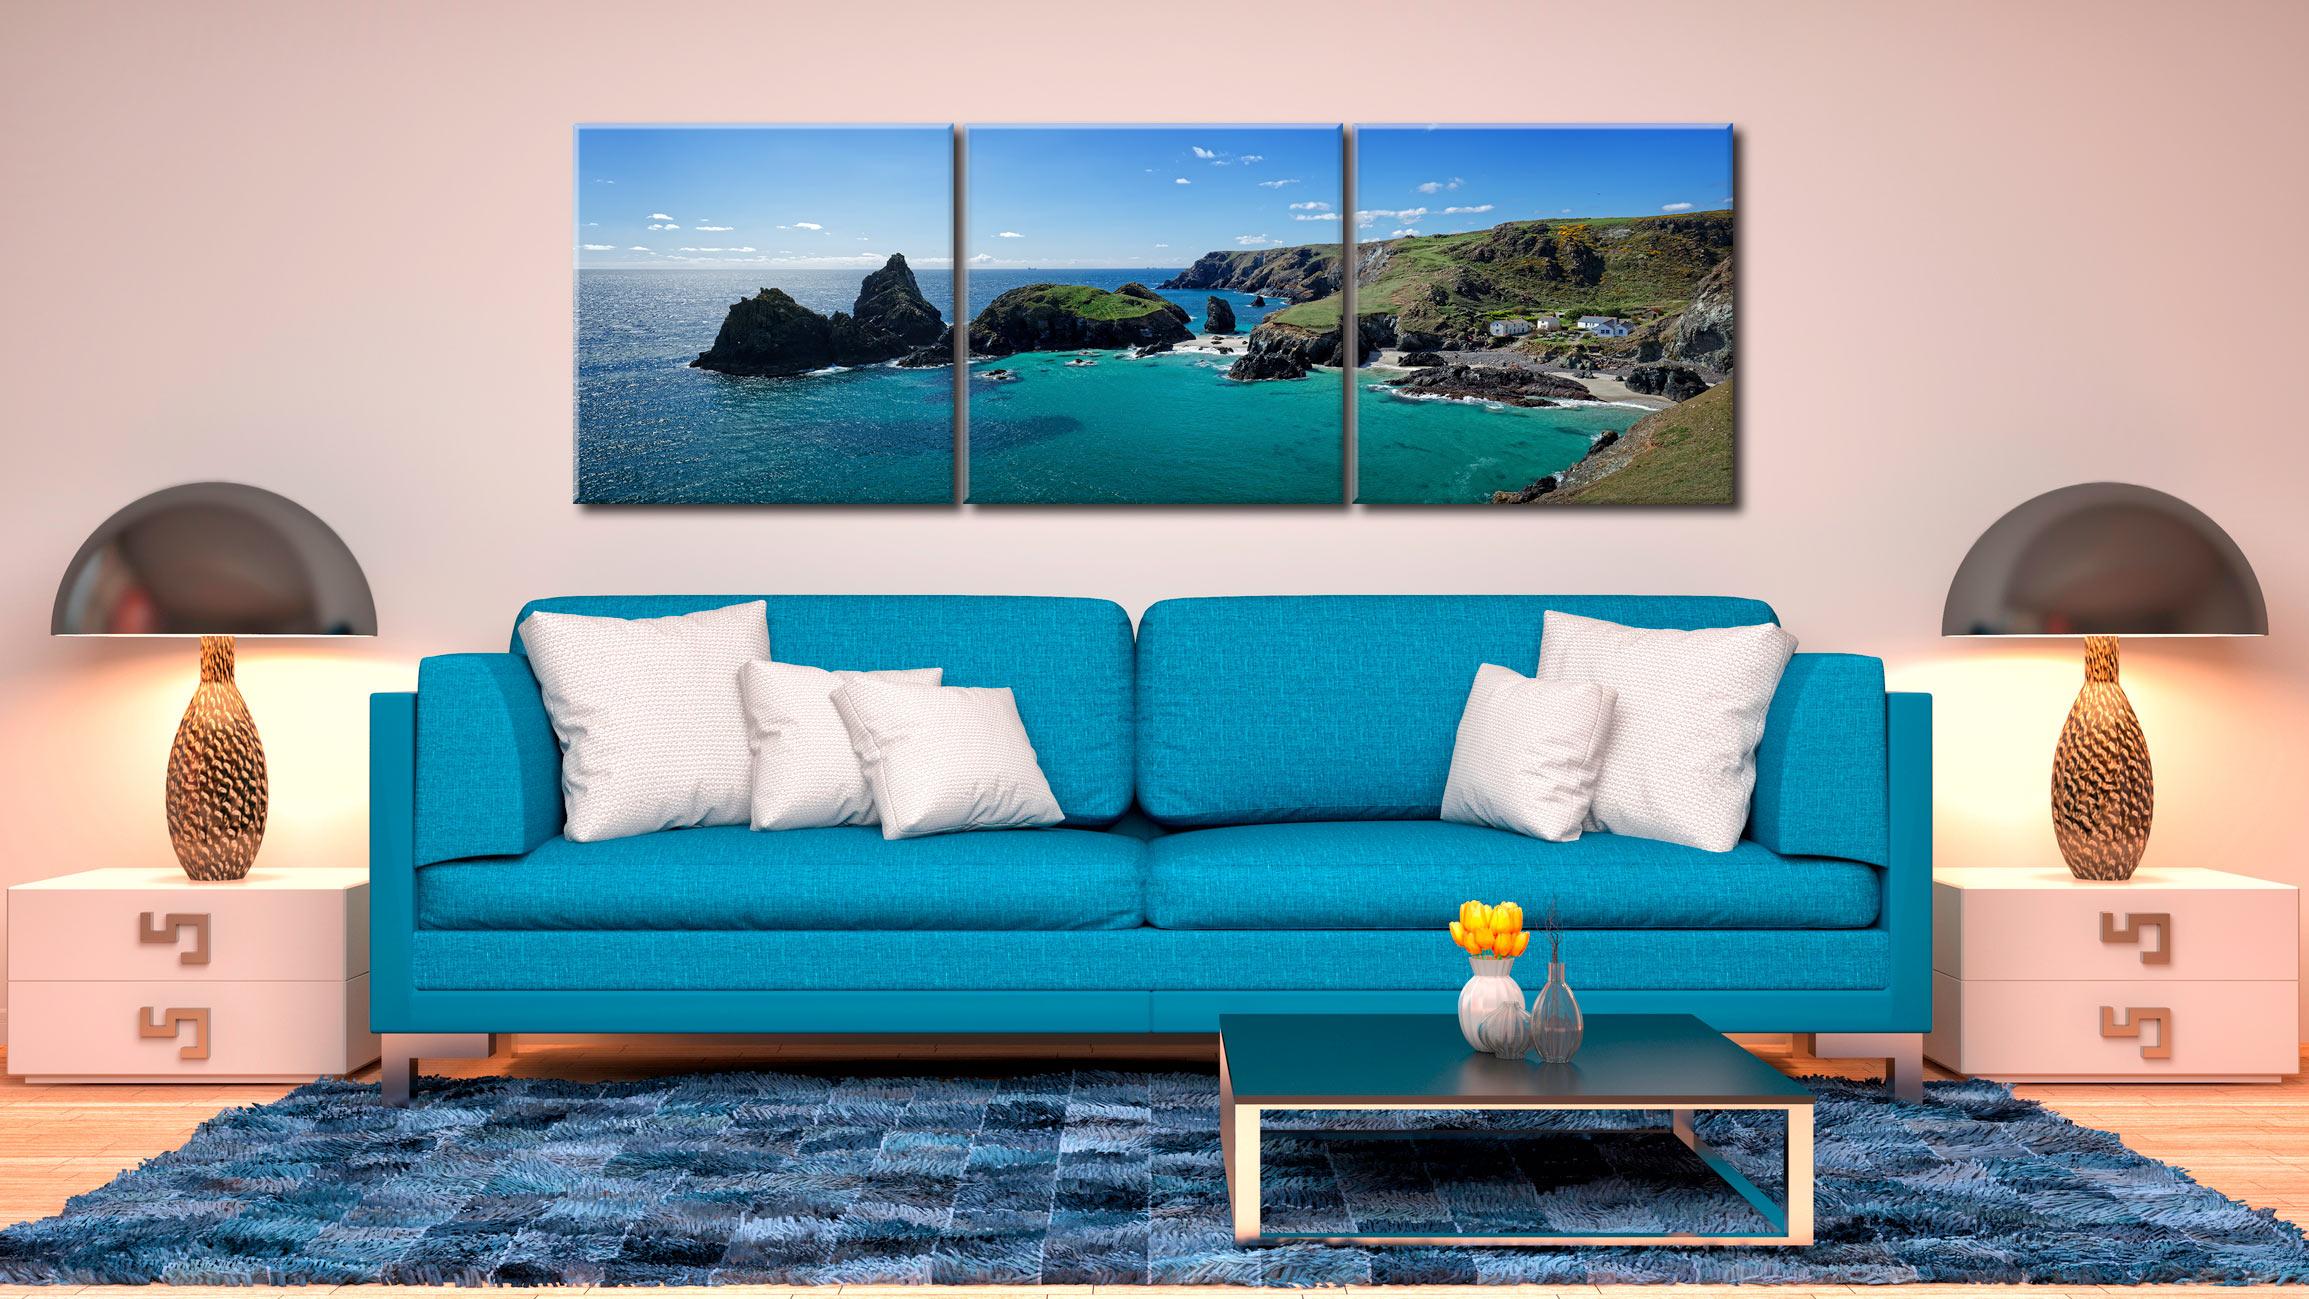 Kynance Cove Panorama - 3 Panel Canvas on Wall